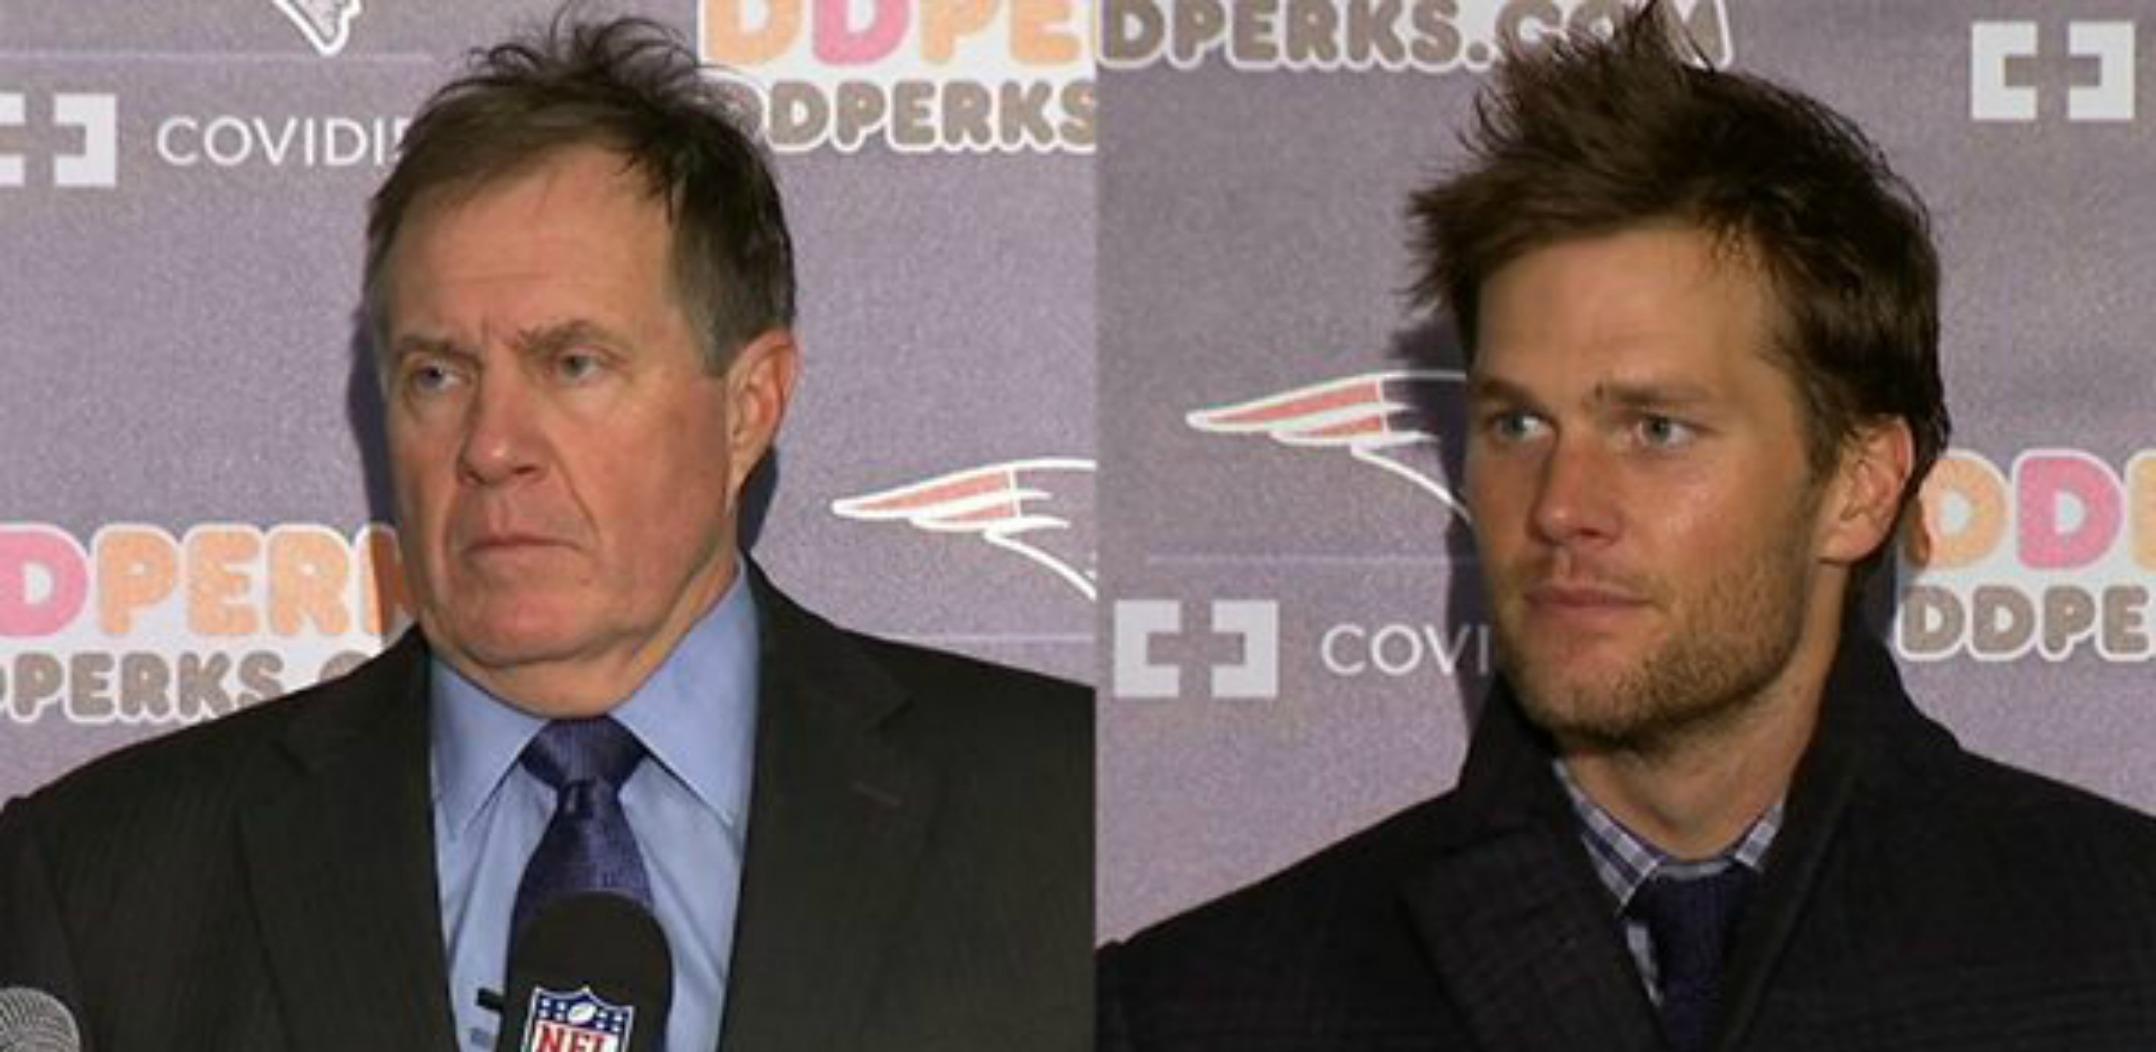 Photo Tom Brady And Bill Belichick Sport Matching Hair Styles